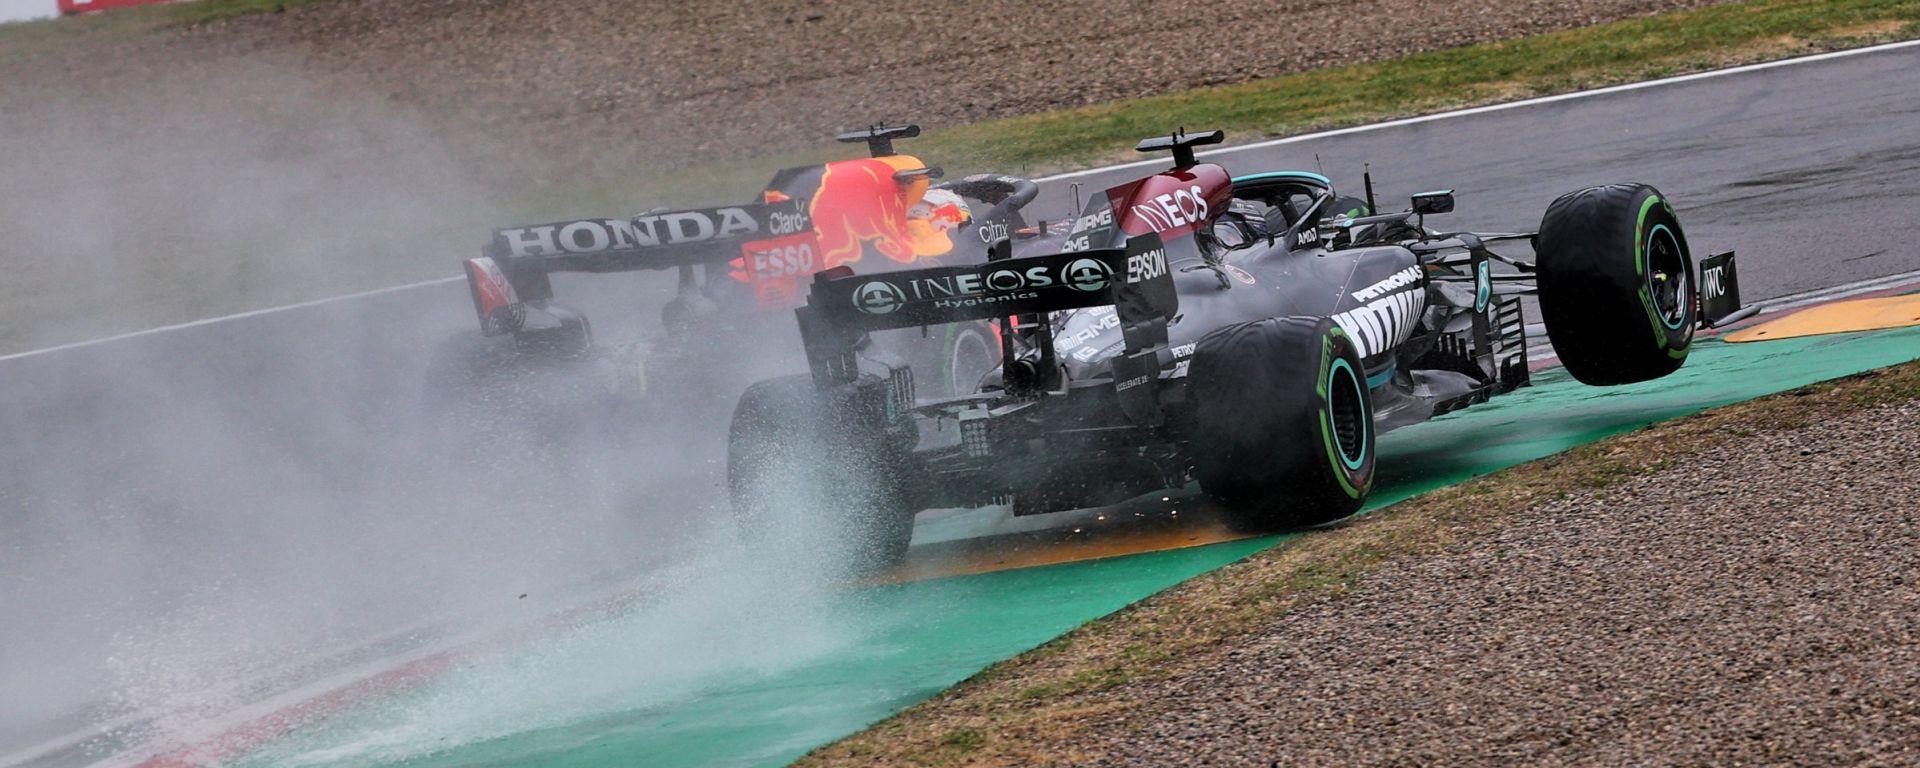 F1, GP Emilia Romagna 2021: Max Verstappen (Red Bull) e Lewis Hamilton (Mercedes)